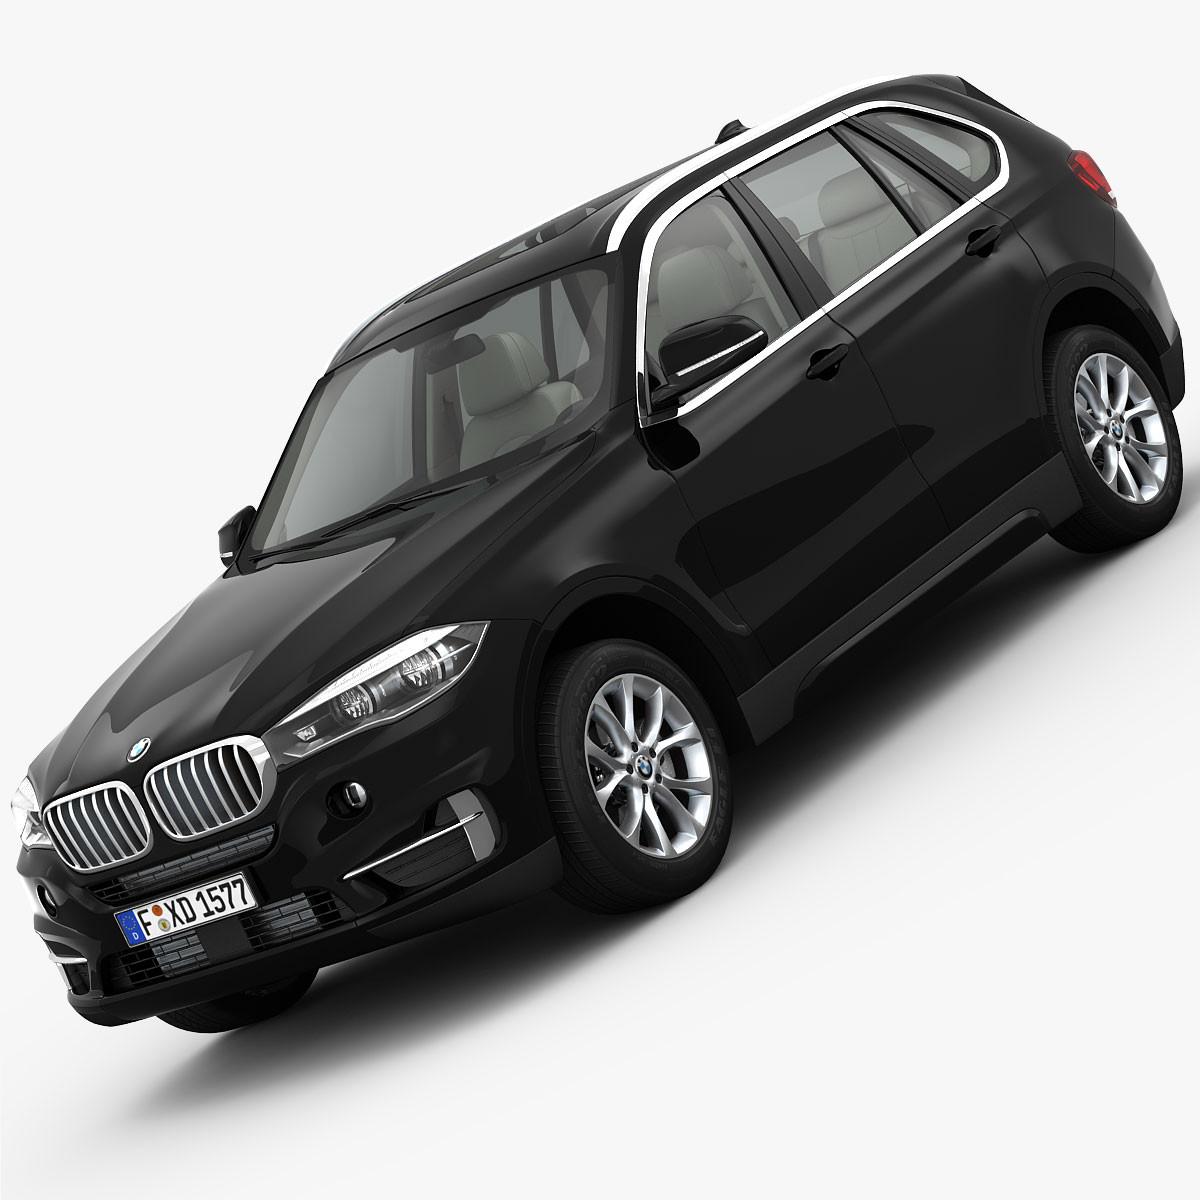 BMW-X5-PureExcellence-1.jpg